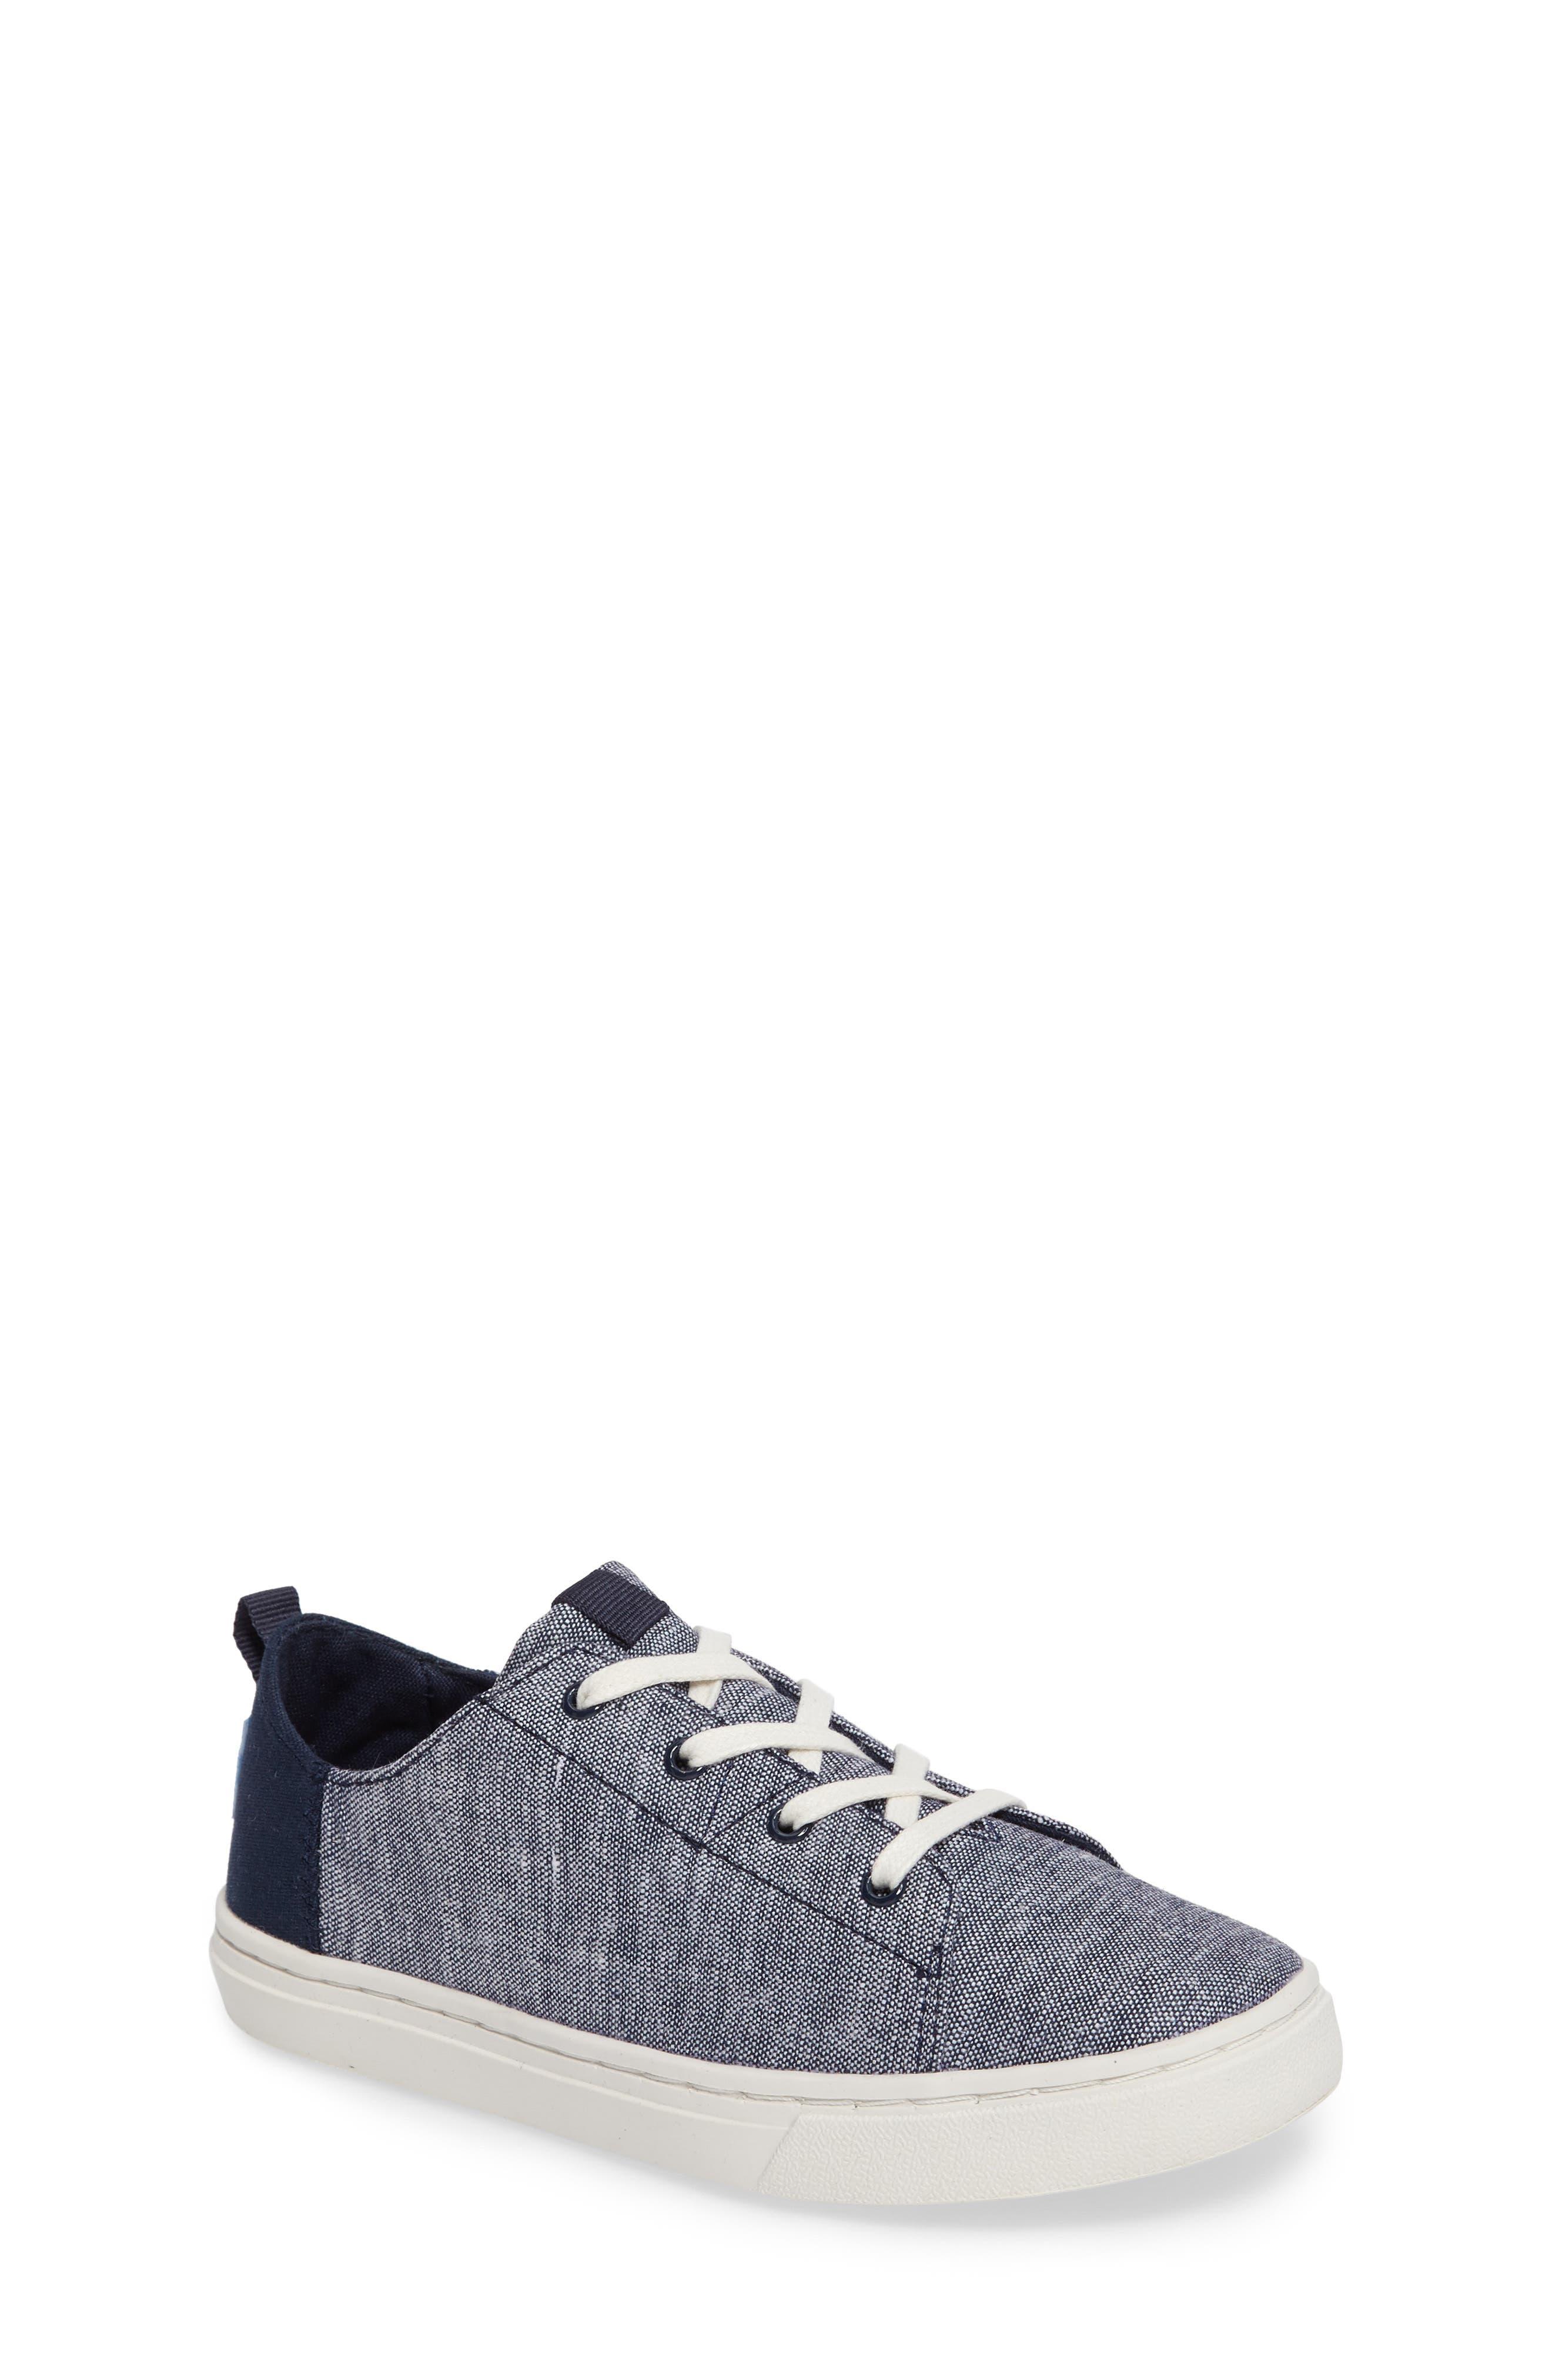 Lenny Sneaker,                         Main,                         color, NAVY CHAMBRAY